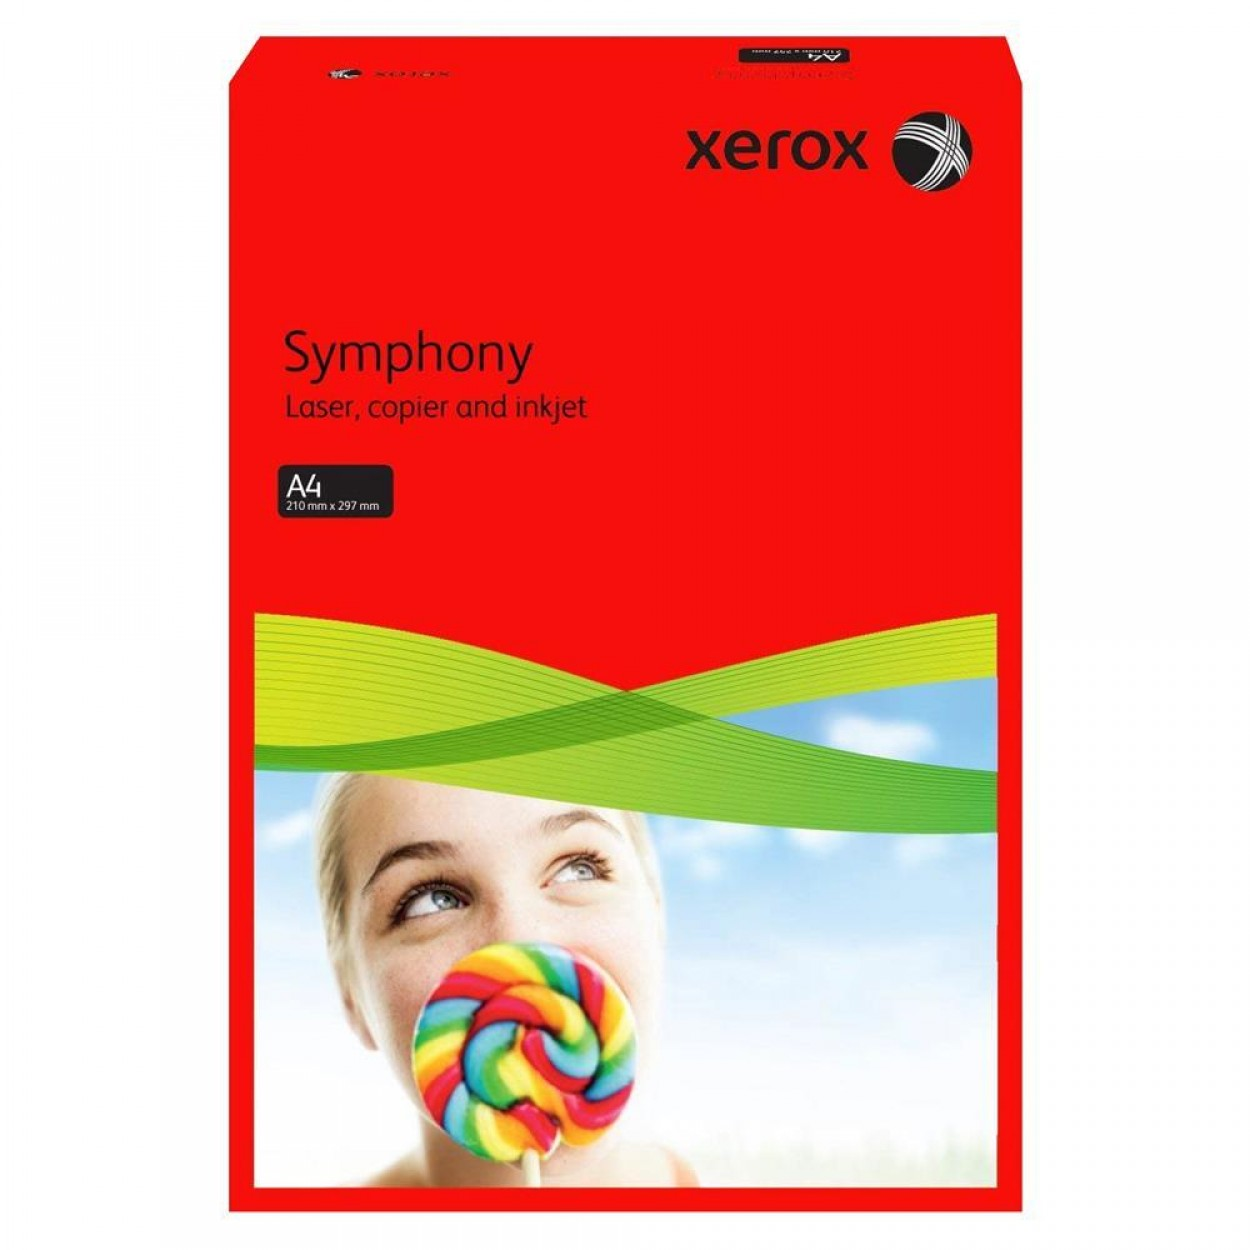 Xerox Symphony Renkli A4 Fotokopi Kağıdı 80 gr 500'lü Kırmızı